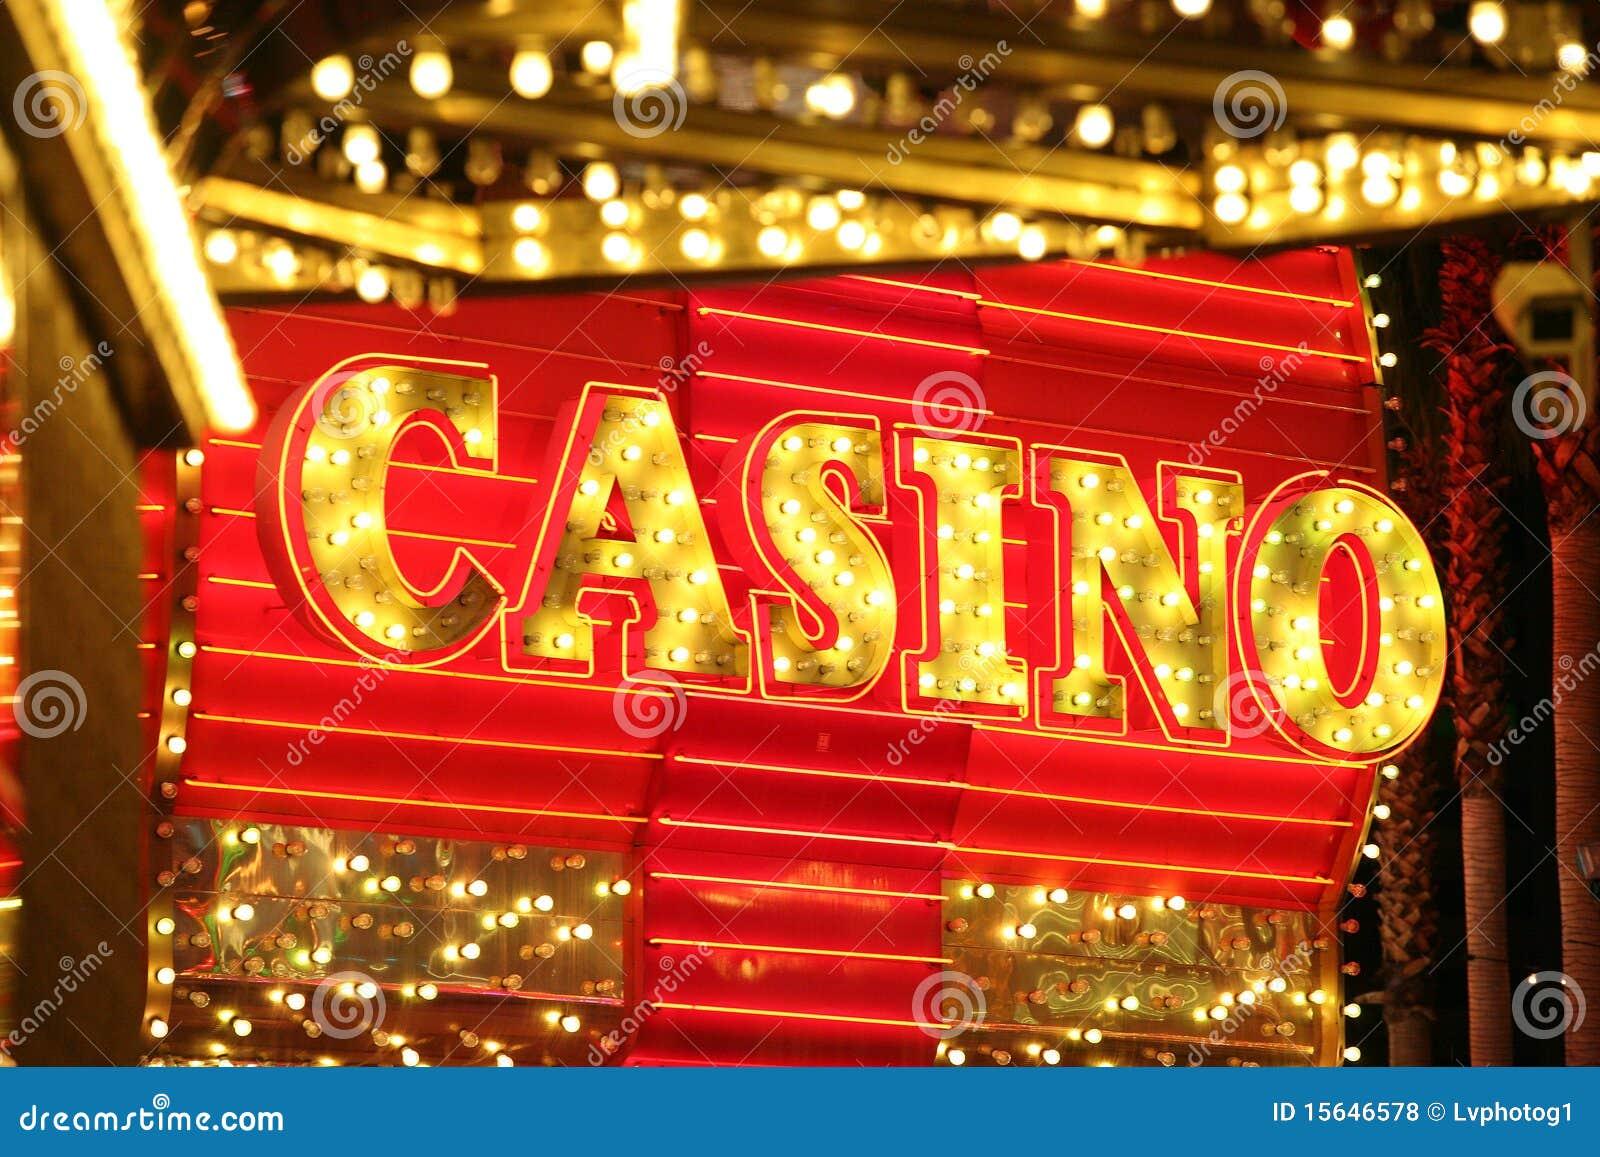 Neon Casino Sign Editorial Stock Photo Image Of Lighting 15646578